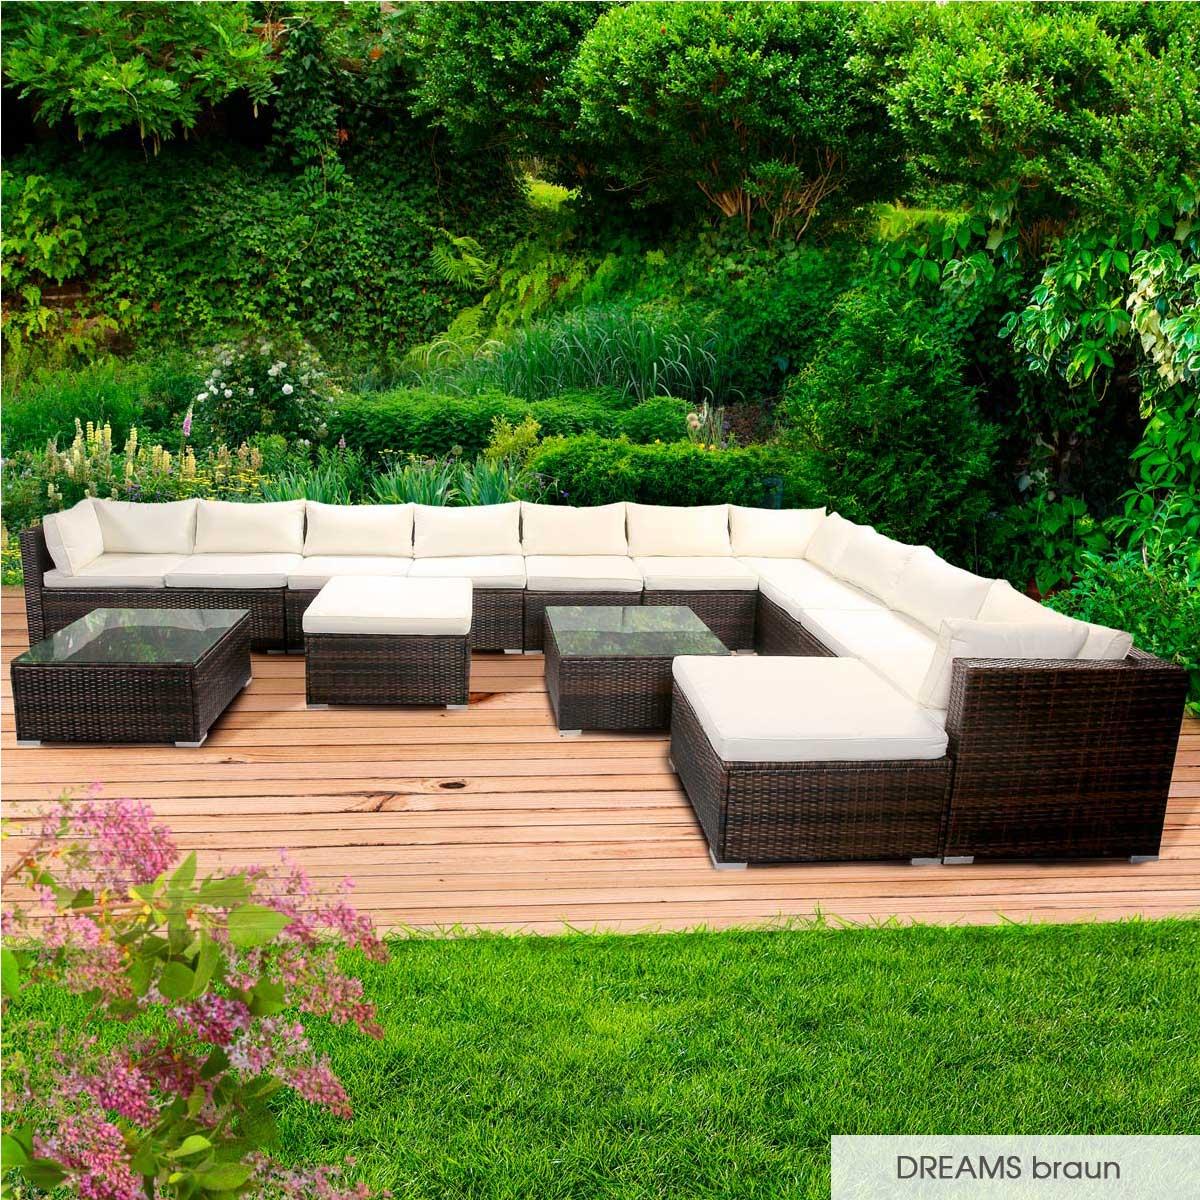 Gartenmoebel-Poly-Rattan-Lounge-Moebel-Sitzgarnitur-Gartengarnitur-Sitzgruppe-Sofa Indexbild 49